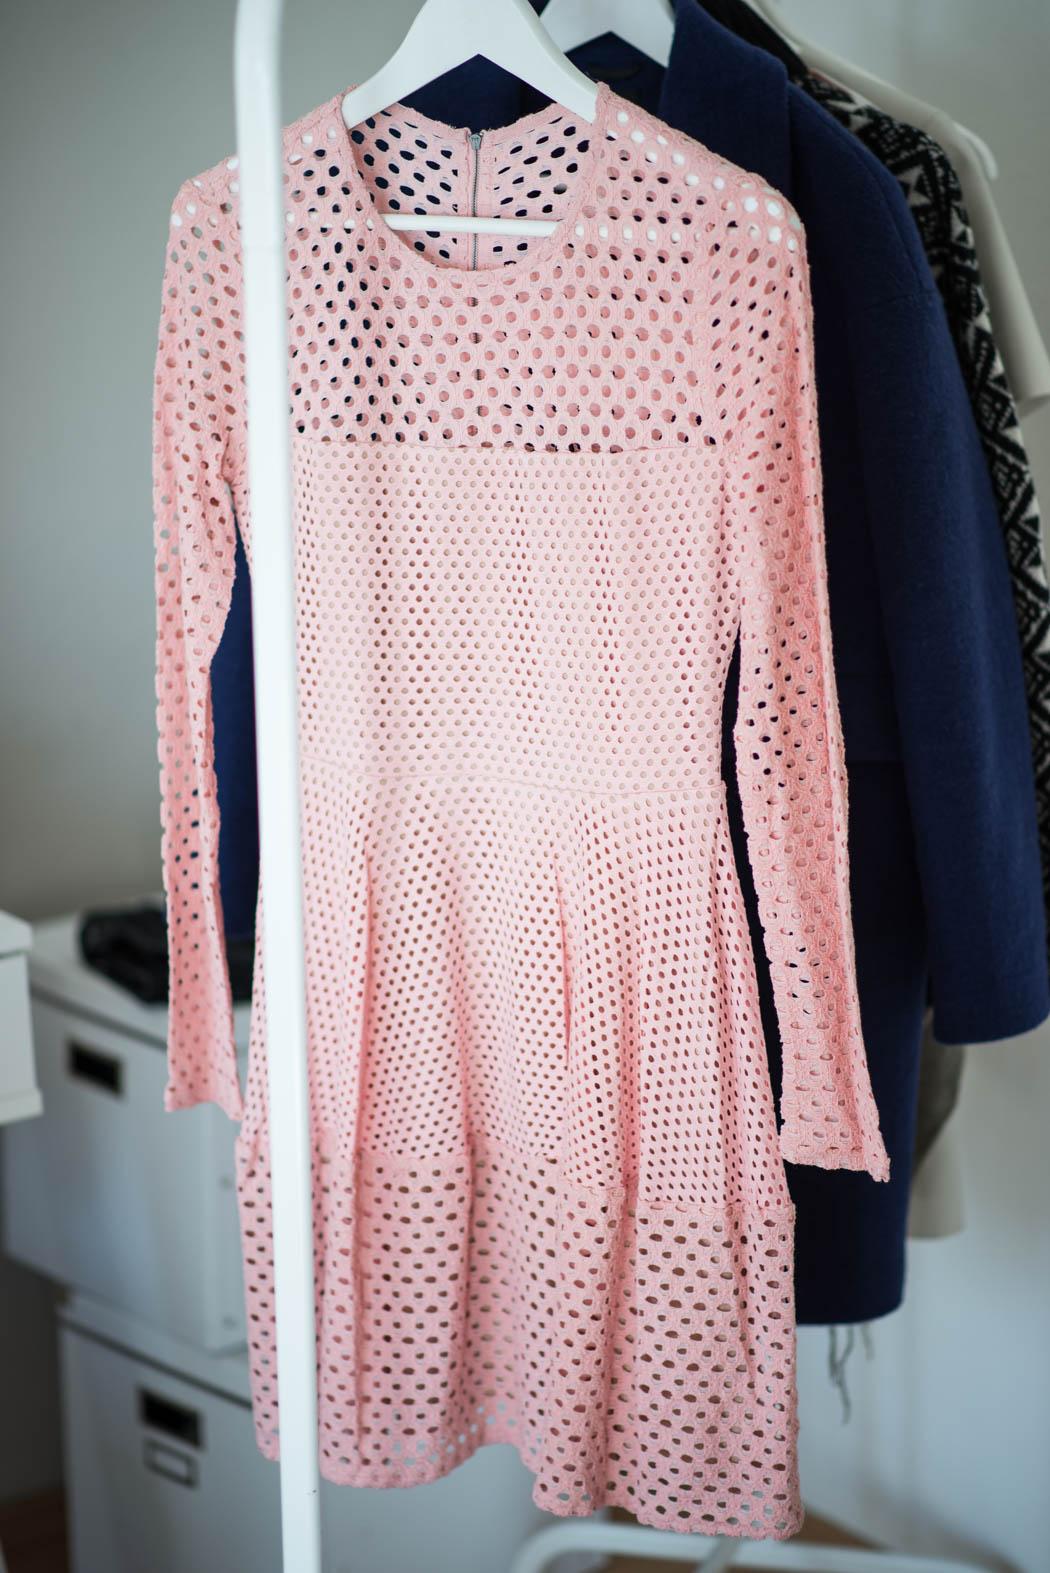 Shoppinghaul-Lindarella-Fashionblogger-München-Deutschland-Fashionblog-1